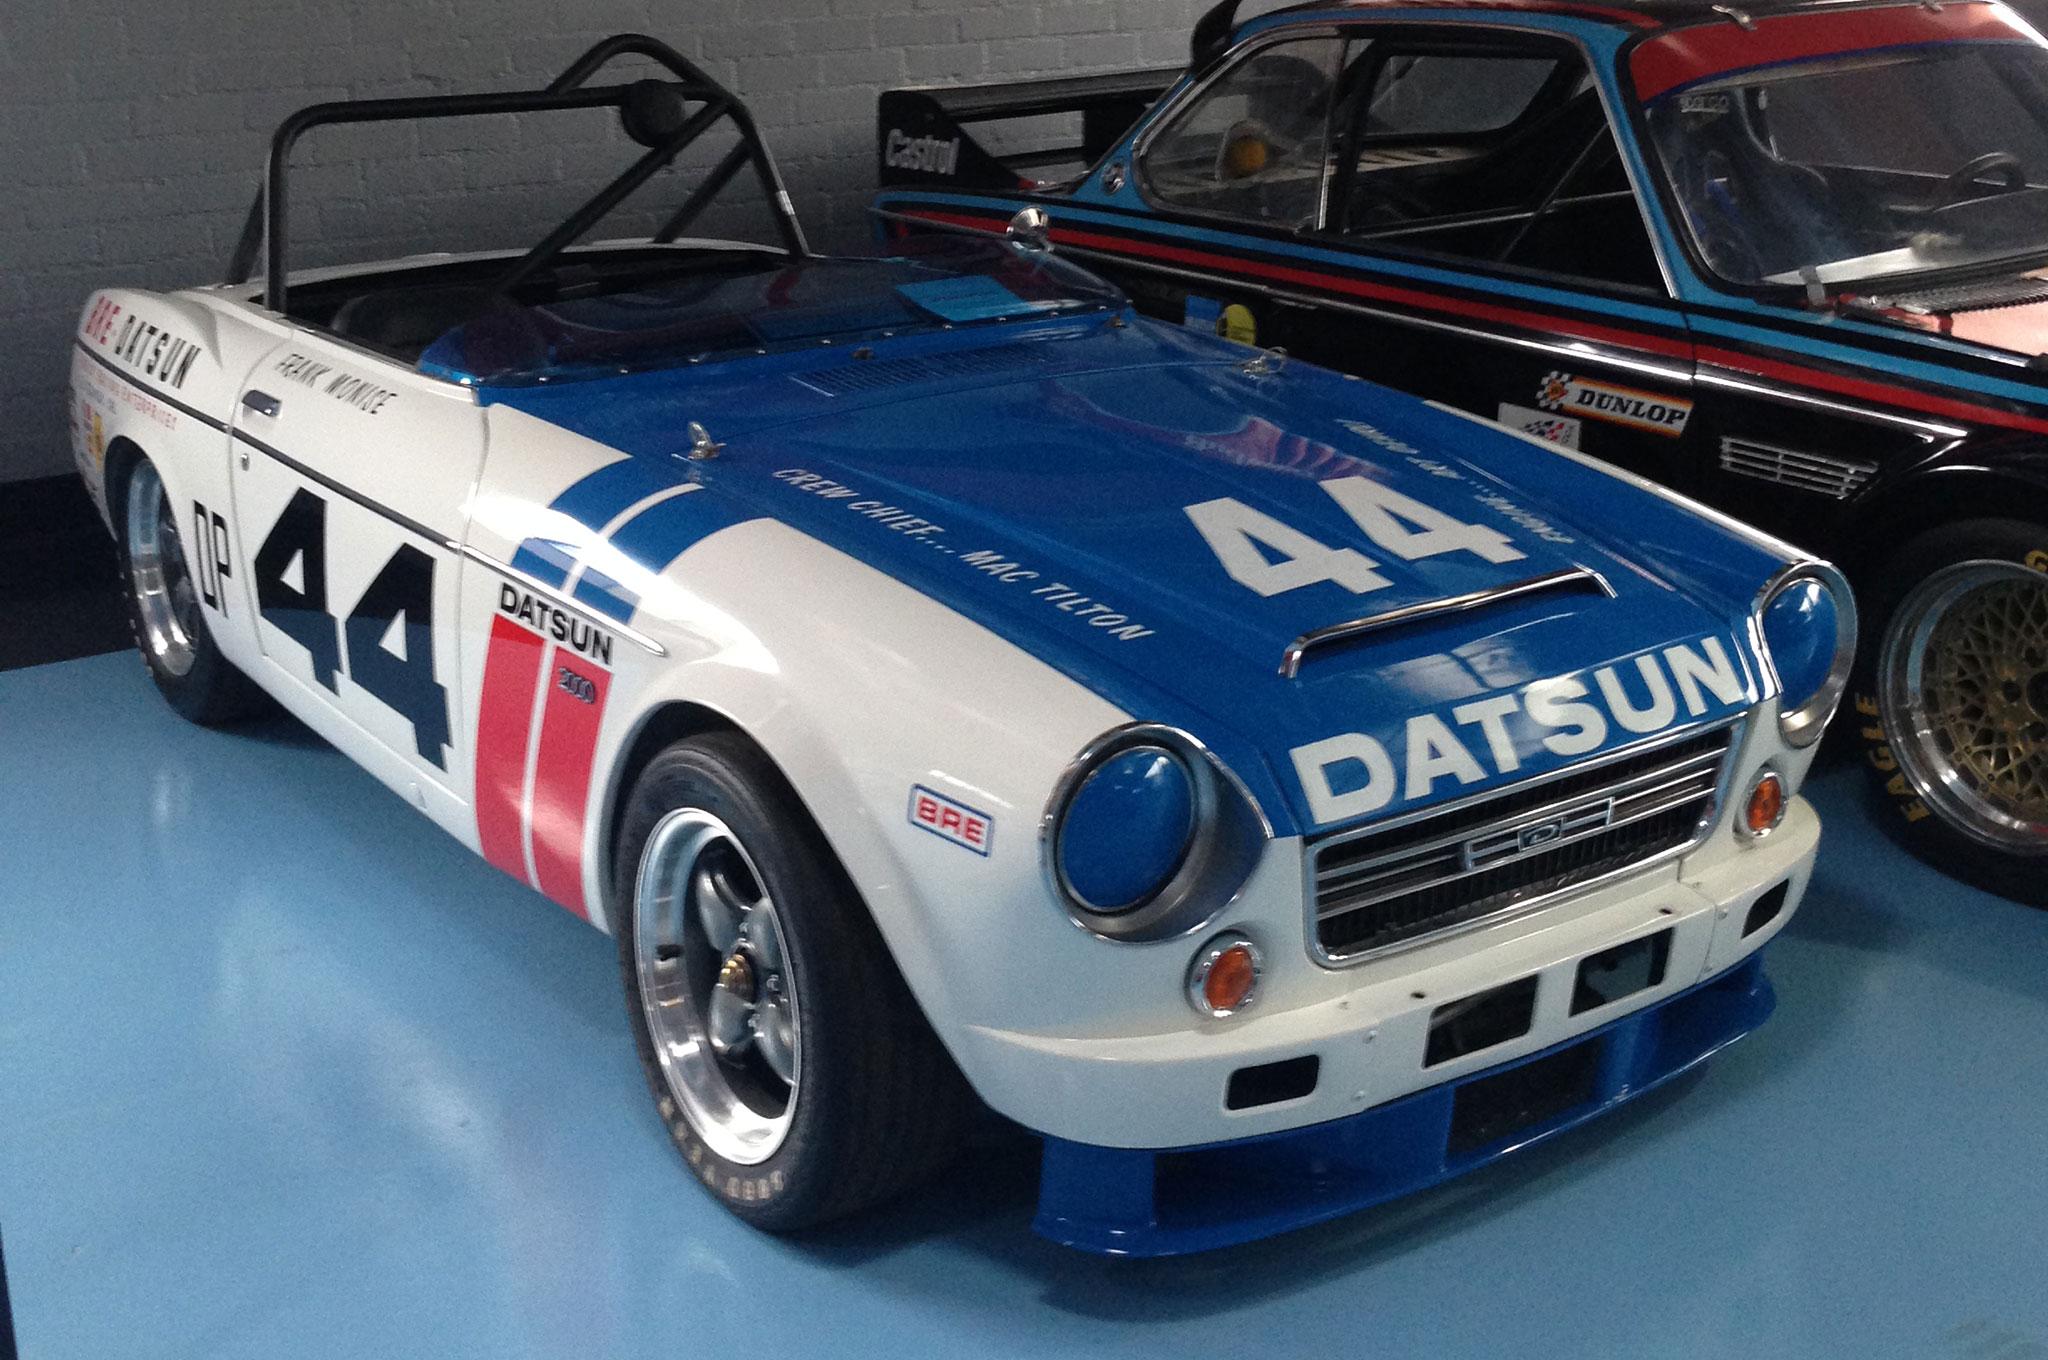 The 5 Coolest Cars In Adam Carolla's Garage